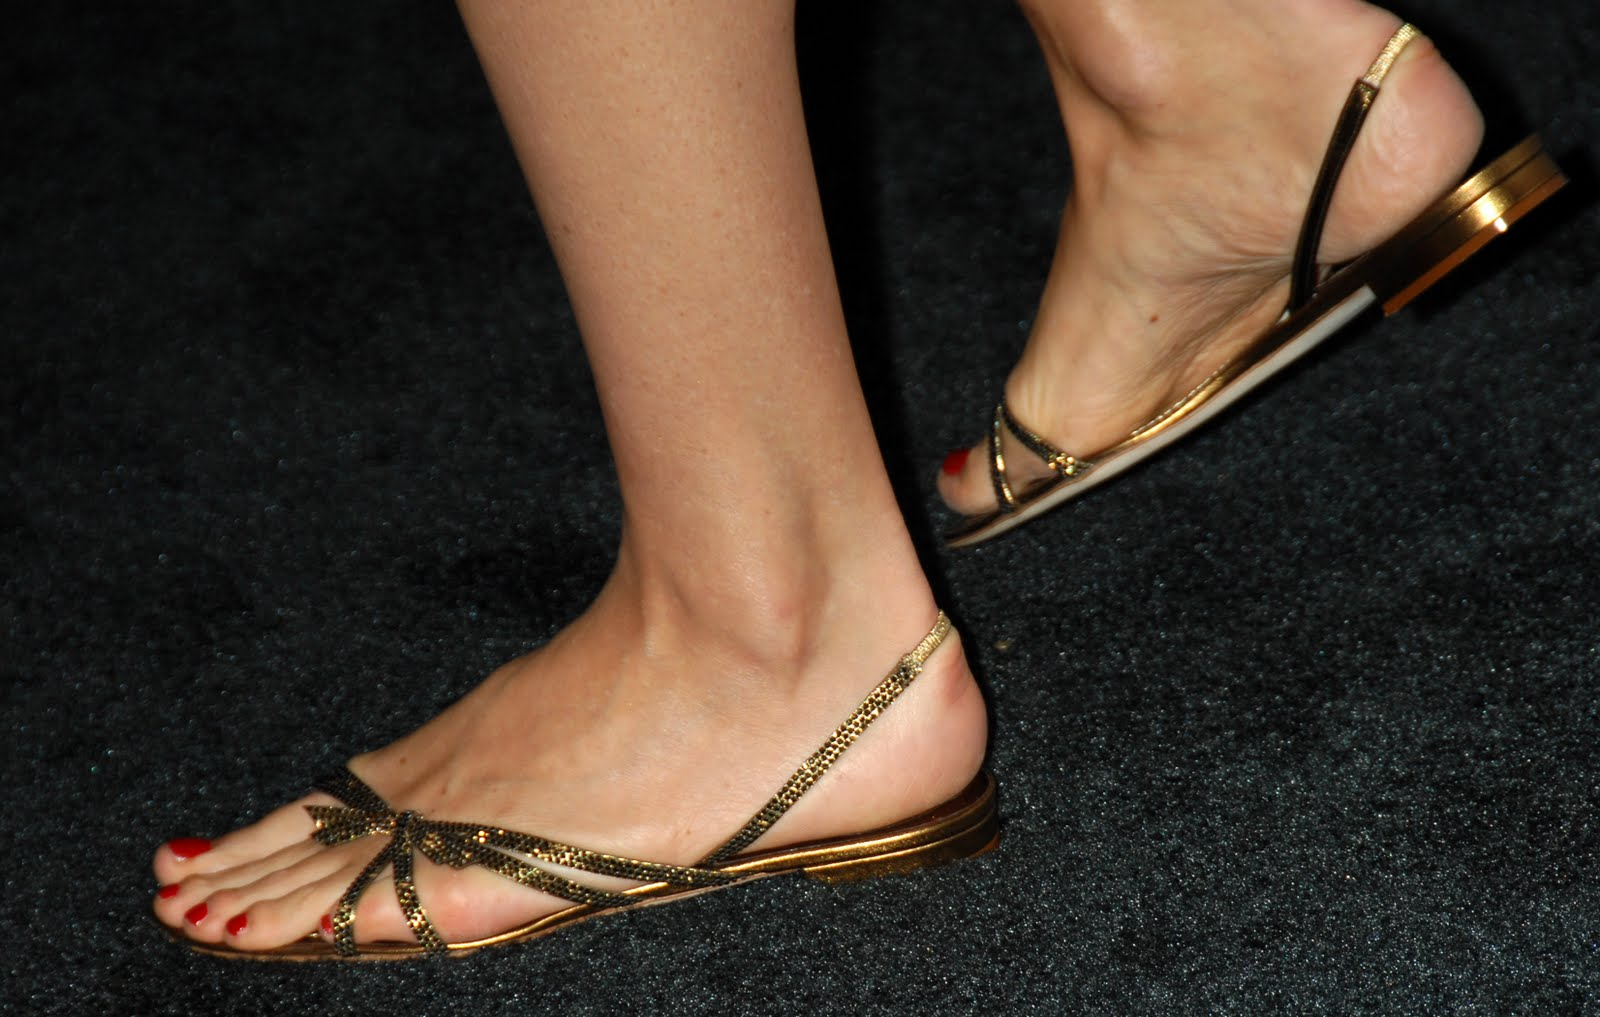 http://1.bp.blogspot.com/_UaLWp72nij4/TDt8z1SAvXI/AAAAAAAAQ-s/-s42lZvA6zI/s1600/saffron-burrows-feet.jpg